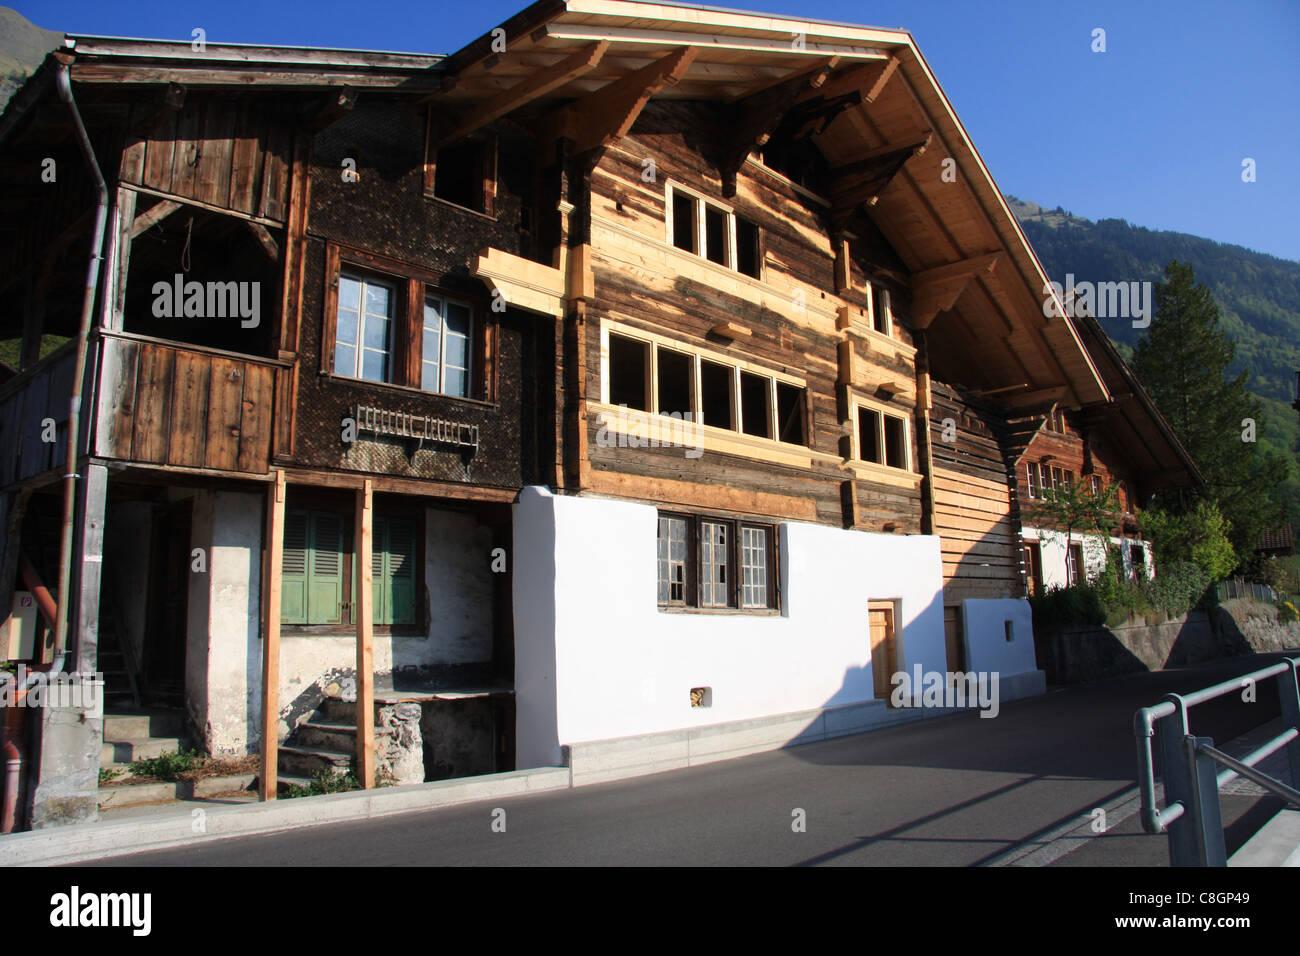 Schweiz Kanton Bern Obere Schilf Bauernhaus Holz Fassade